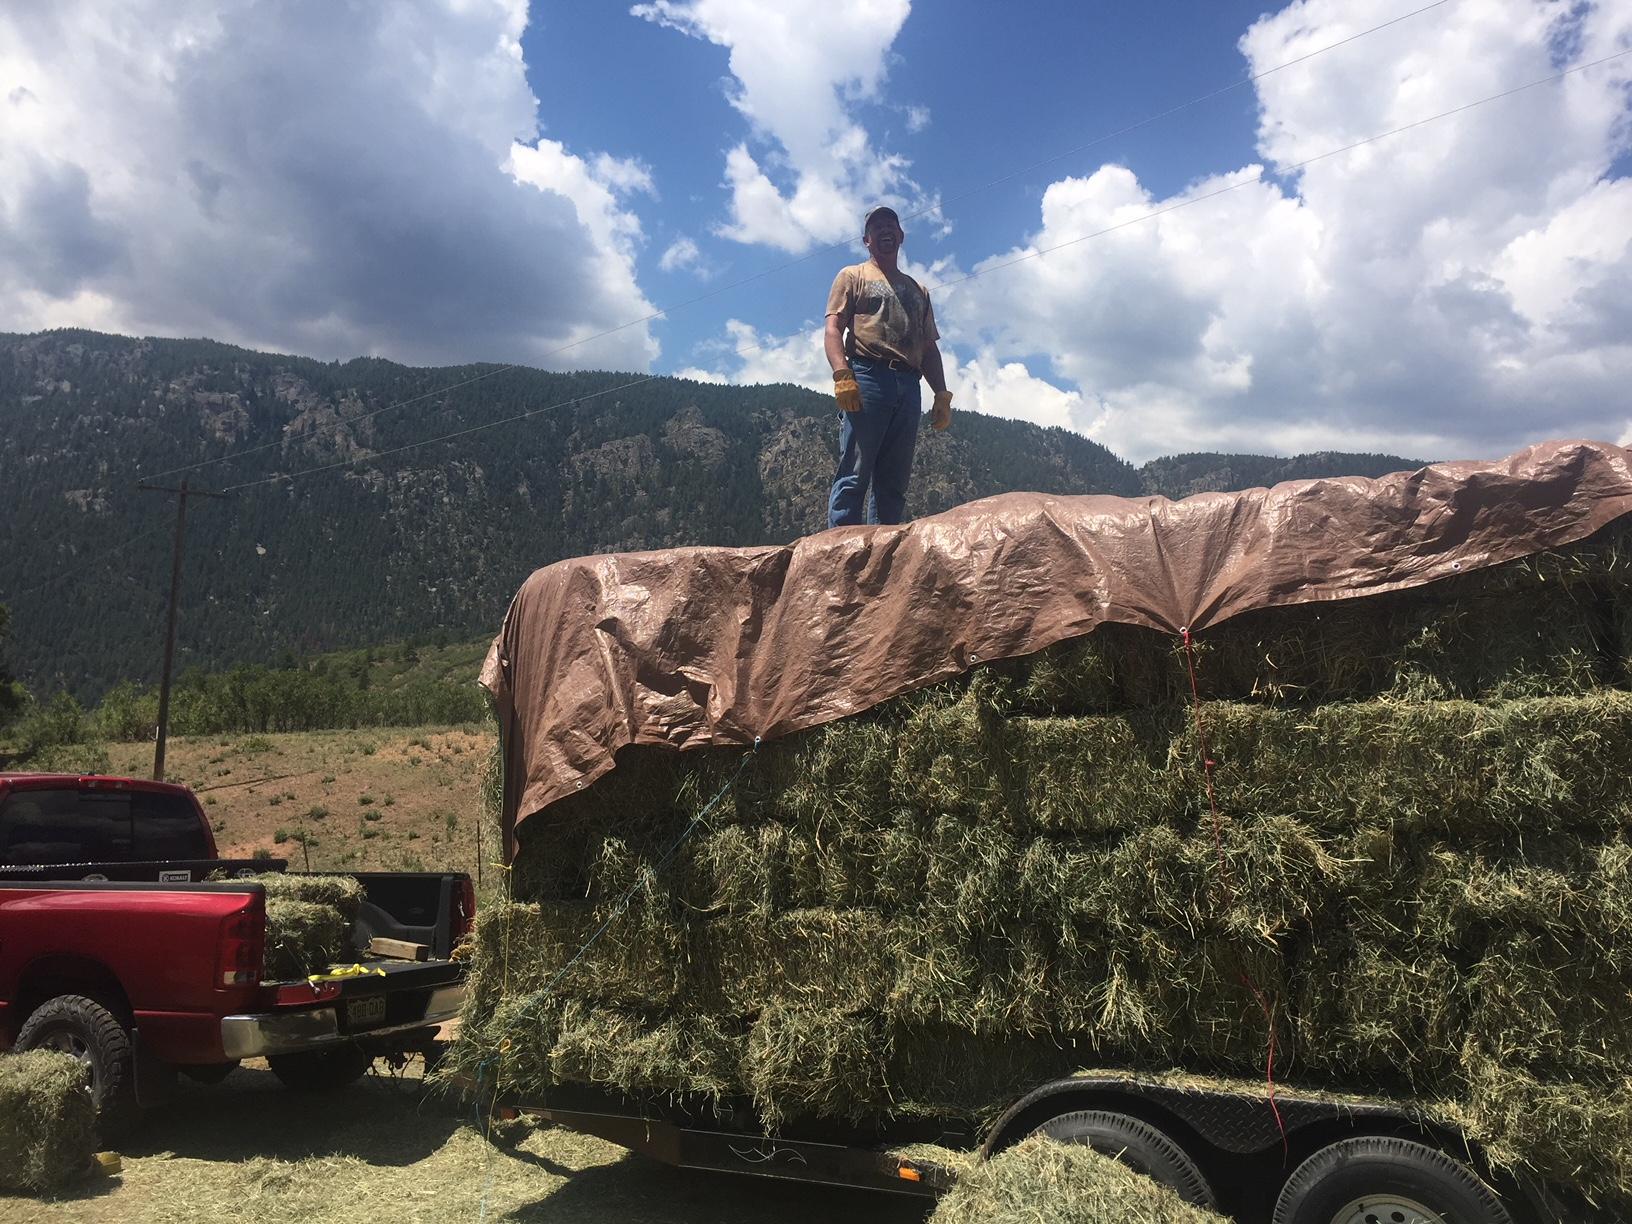 Loading up a customer's trailer at Colorado Horse Hay